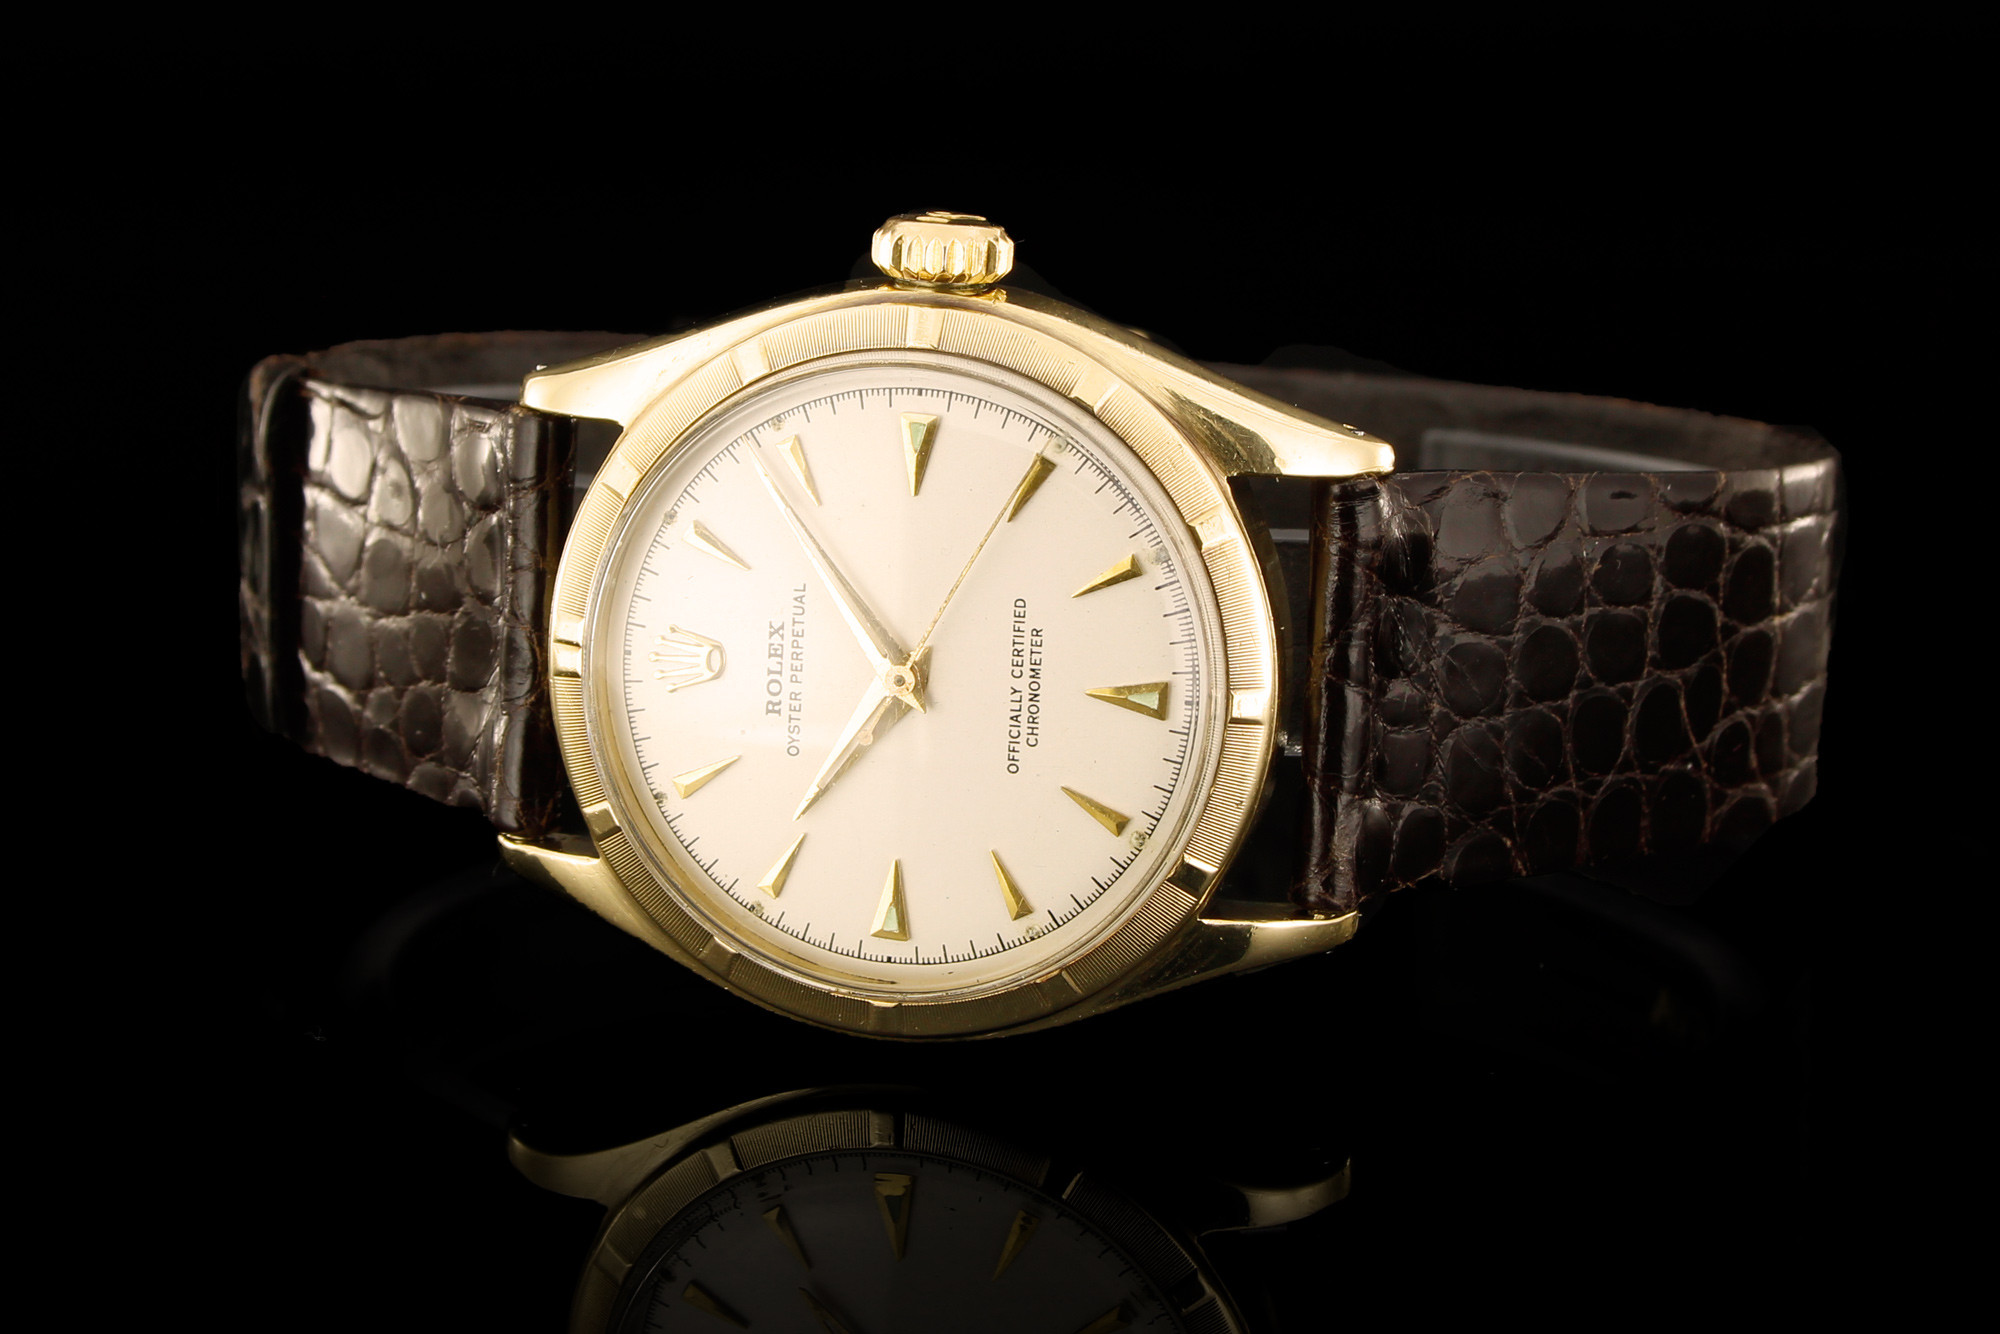 Vintage Rolex Bubbleback Uhren